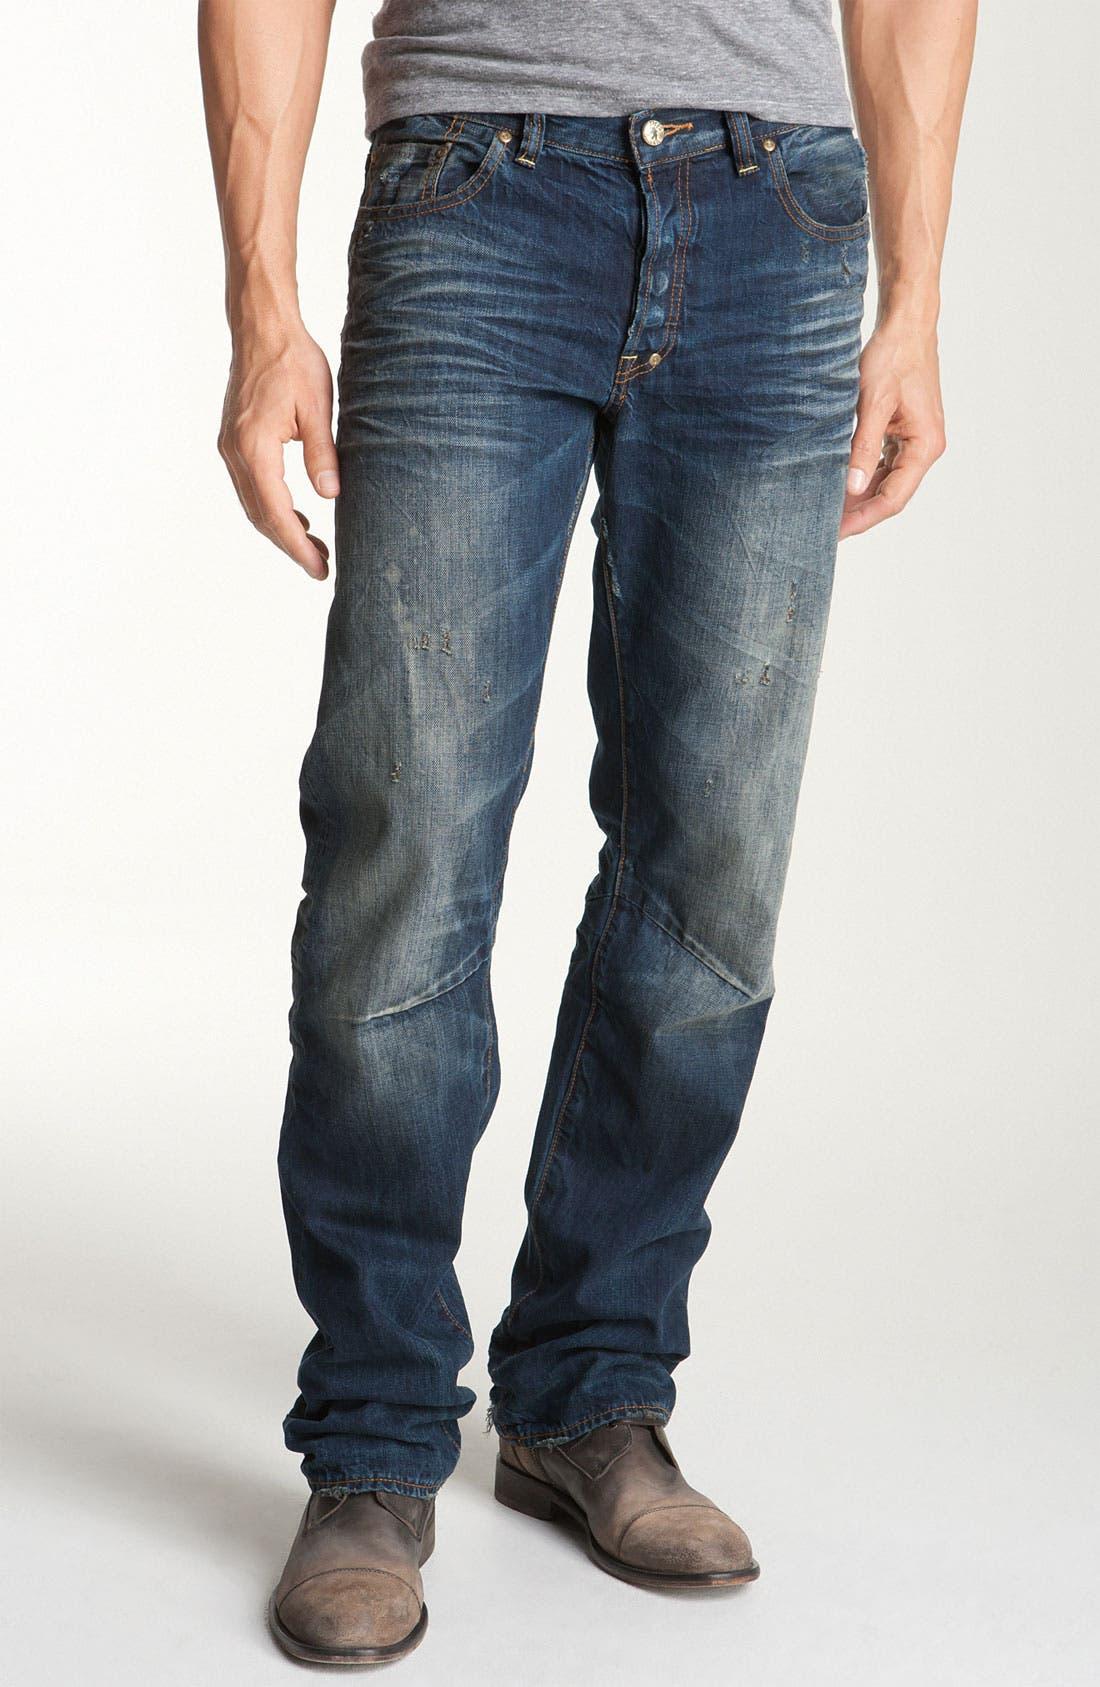 'Barracuda' Straight Leg Jeans,                             Alternate thumbnail 2, color,                             481